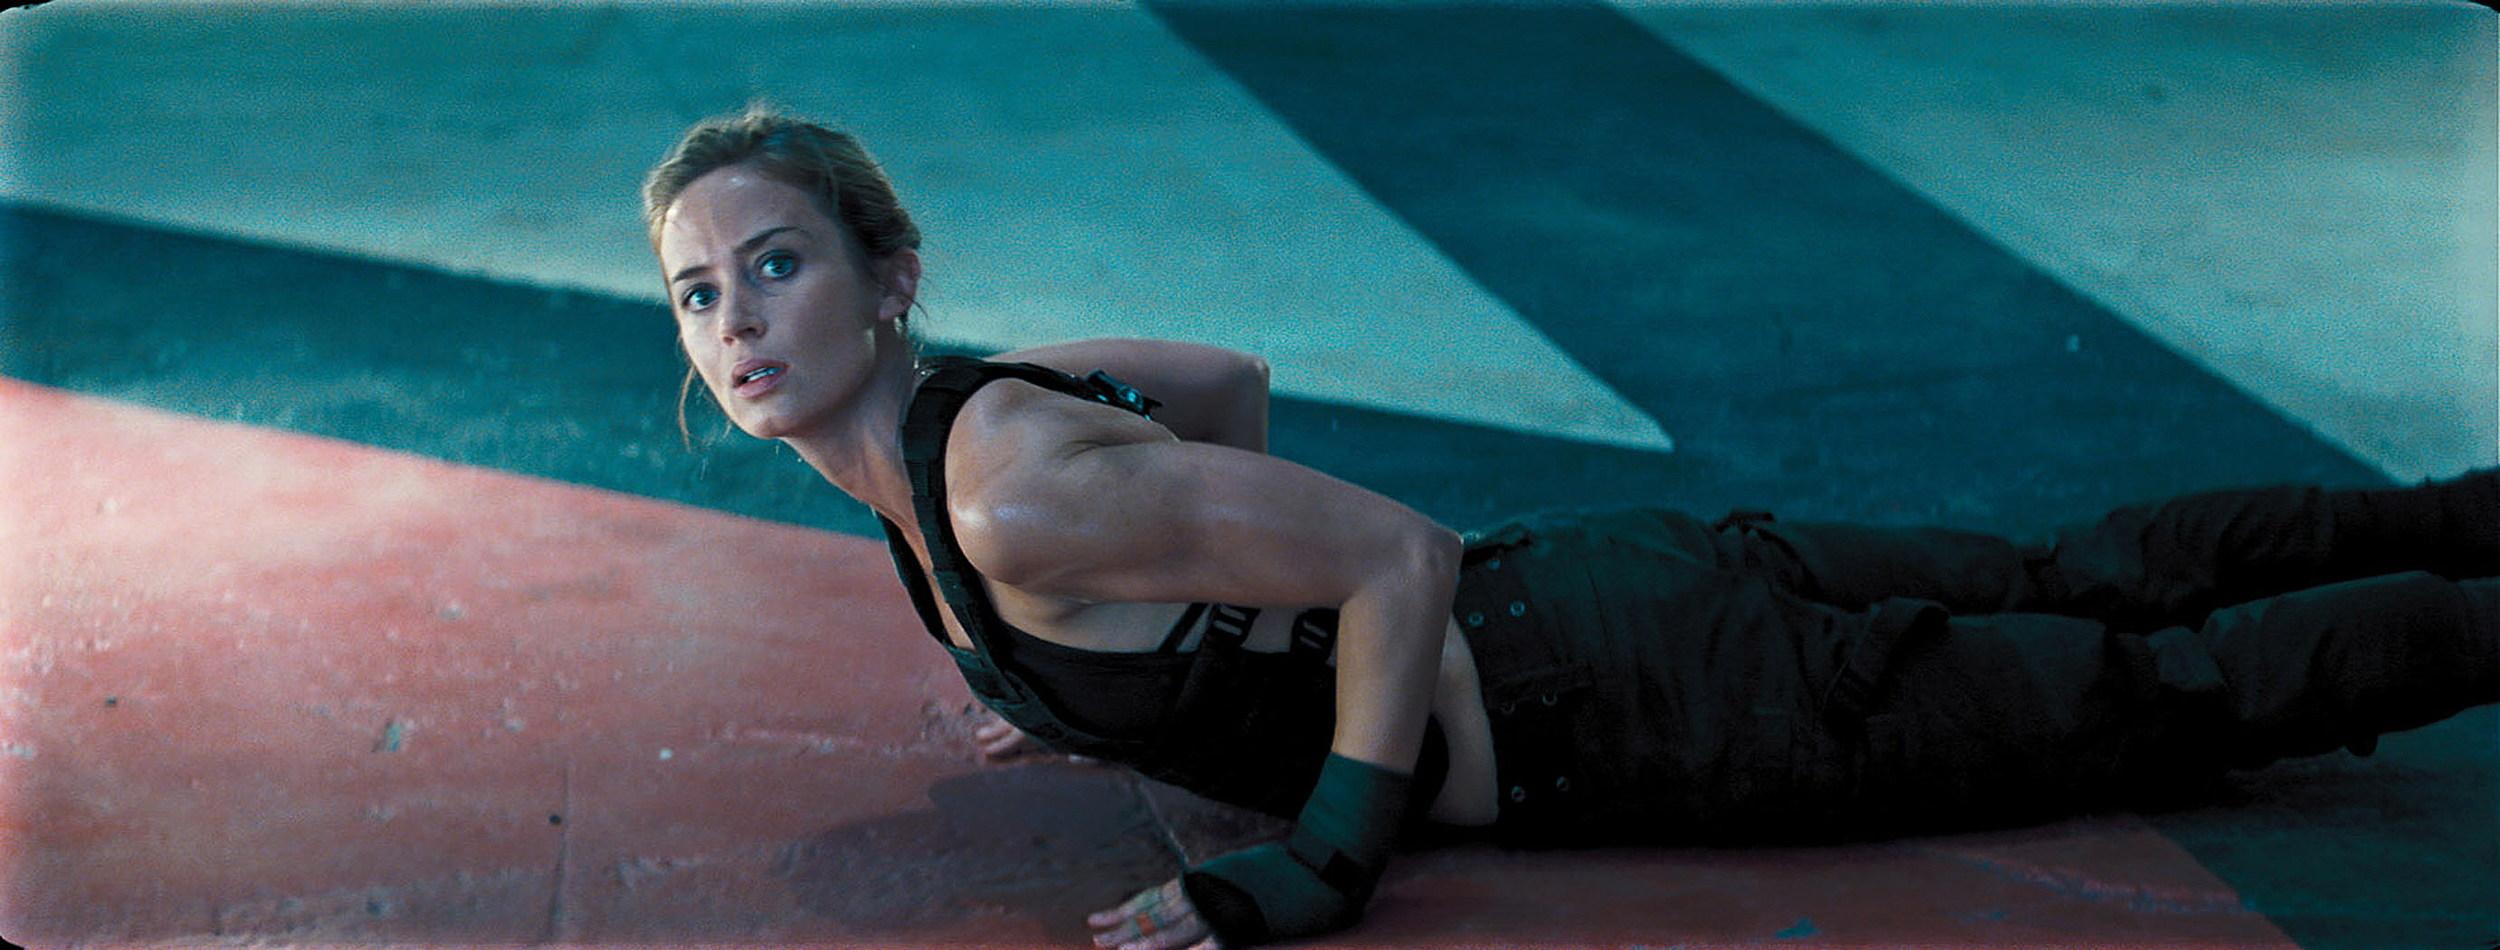 'Edge of Tomorrow' Photos: Tom Cruise vs. Aliens